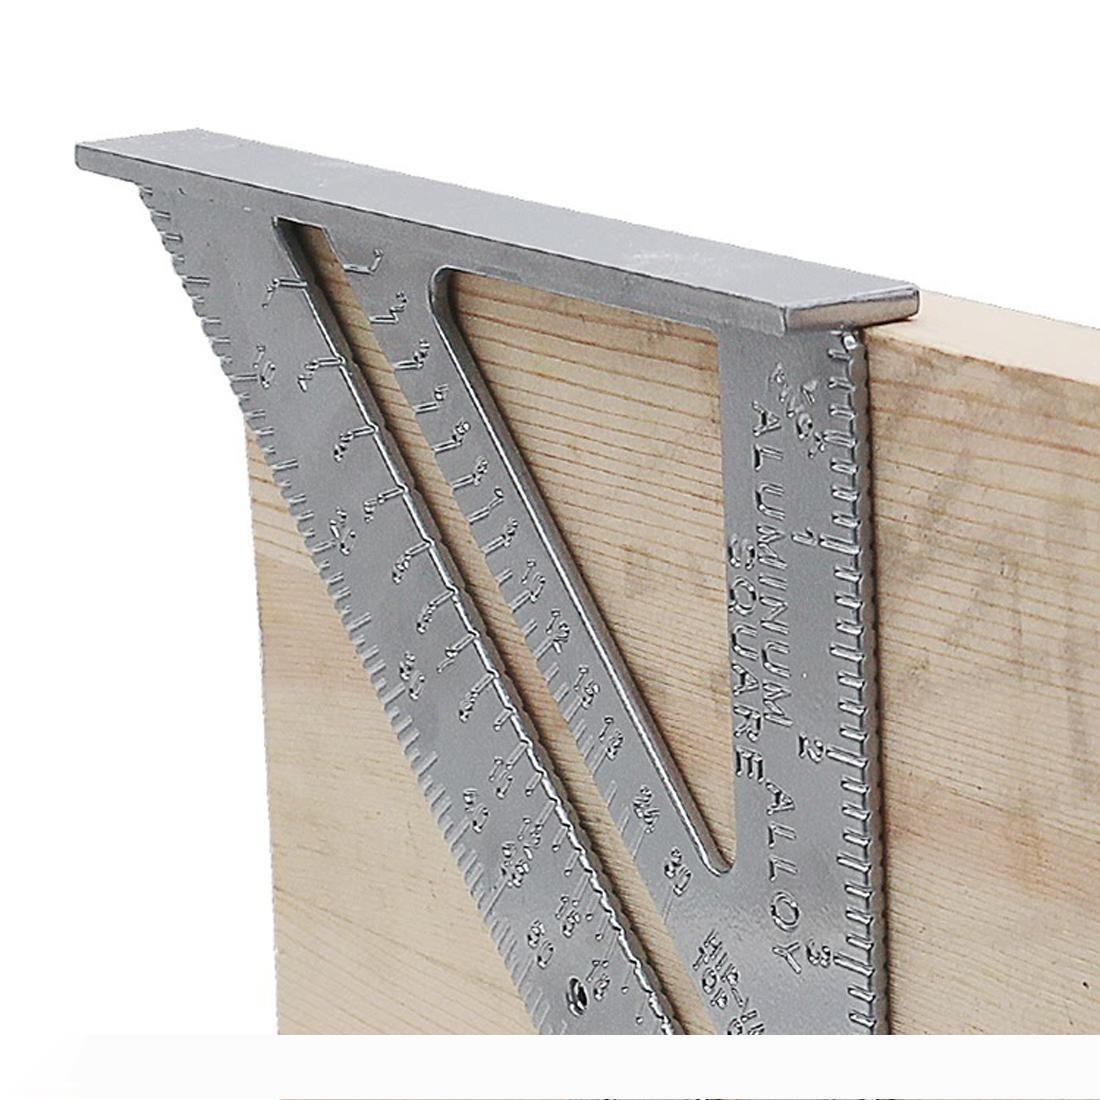 B Speed Square Protractor Aluminum Alloy Miter Framing Tri-square Line Scriber Saw Guide Measurement Inch Carpenter Ruler Dropship